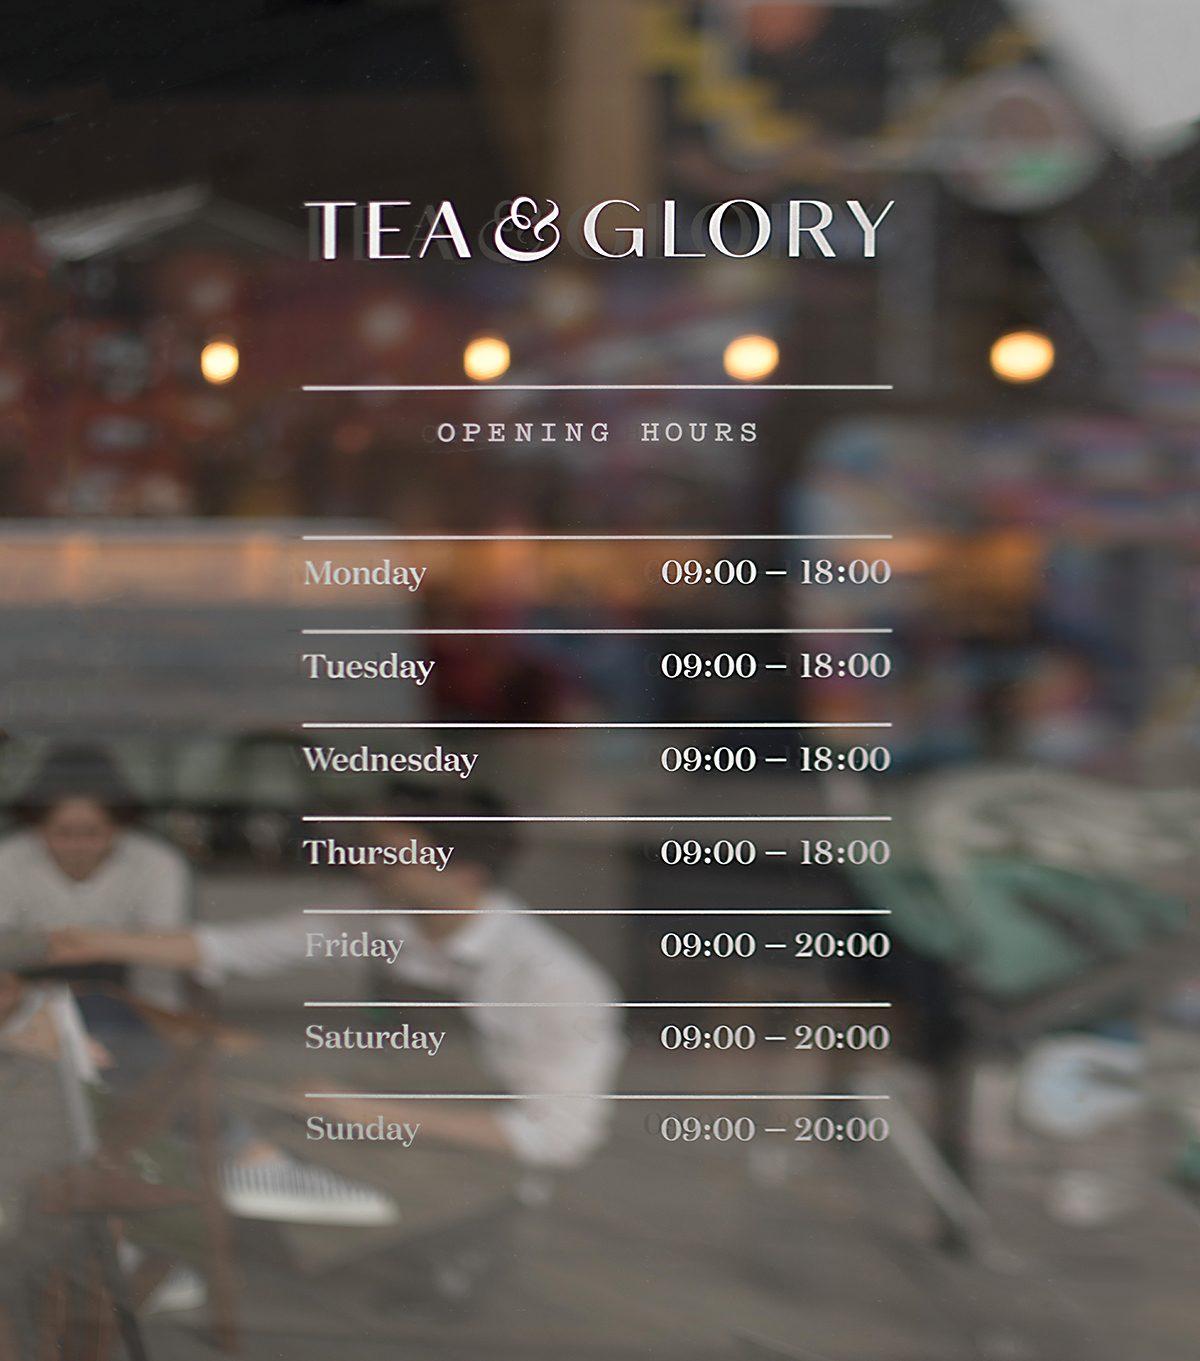 Tea & Glory